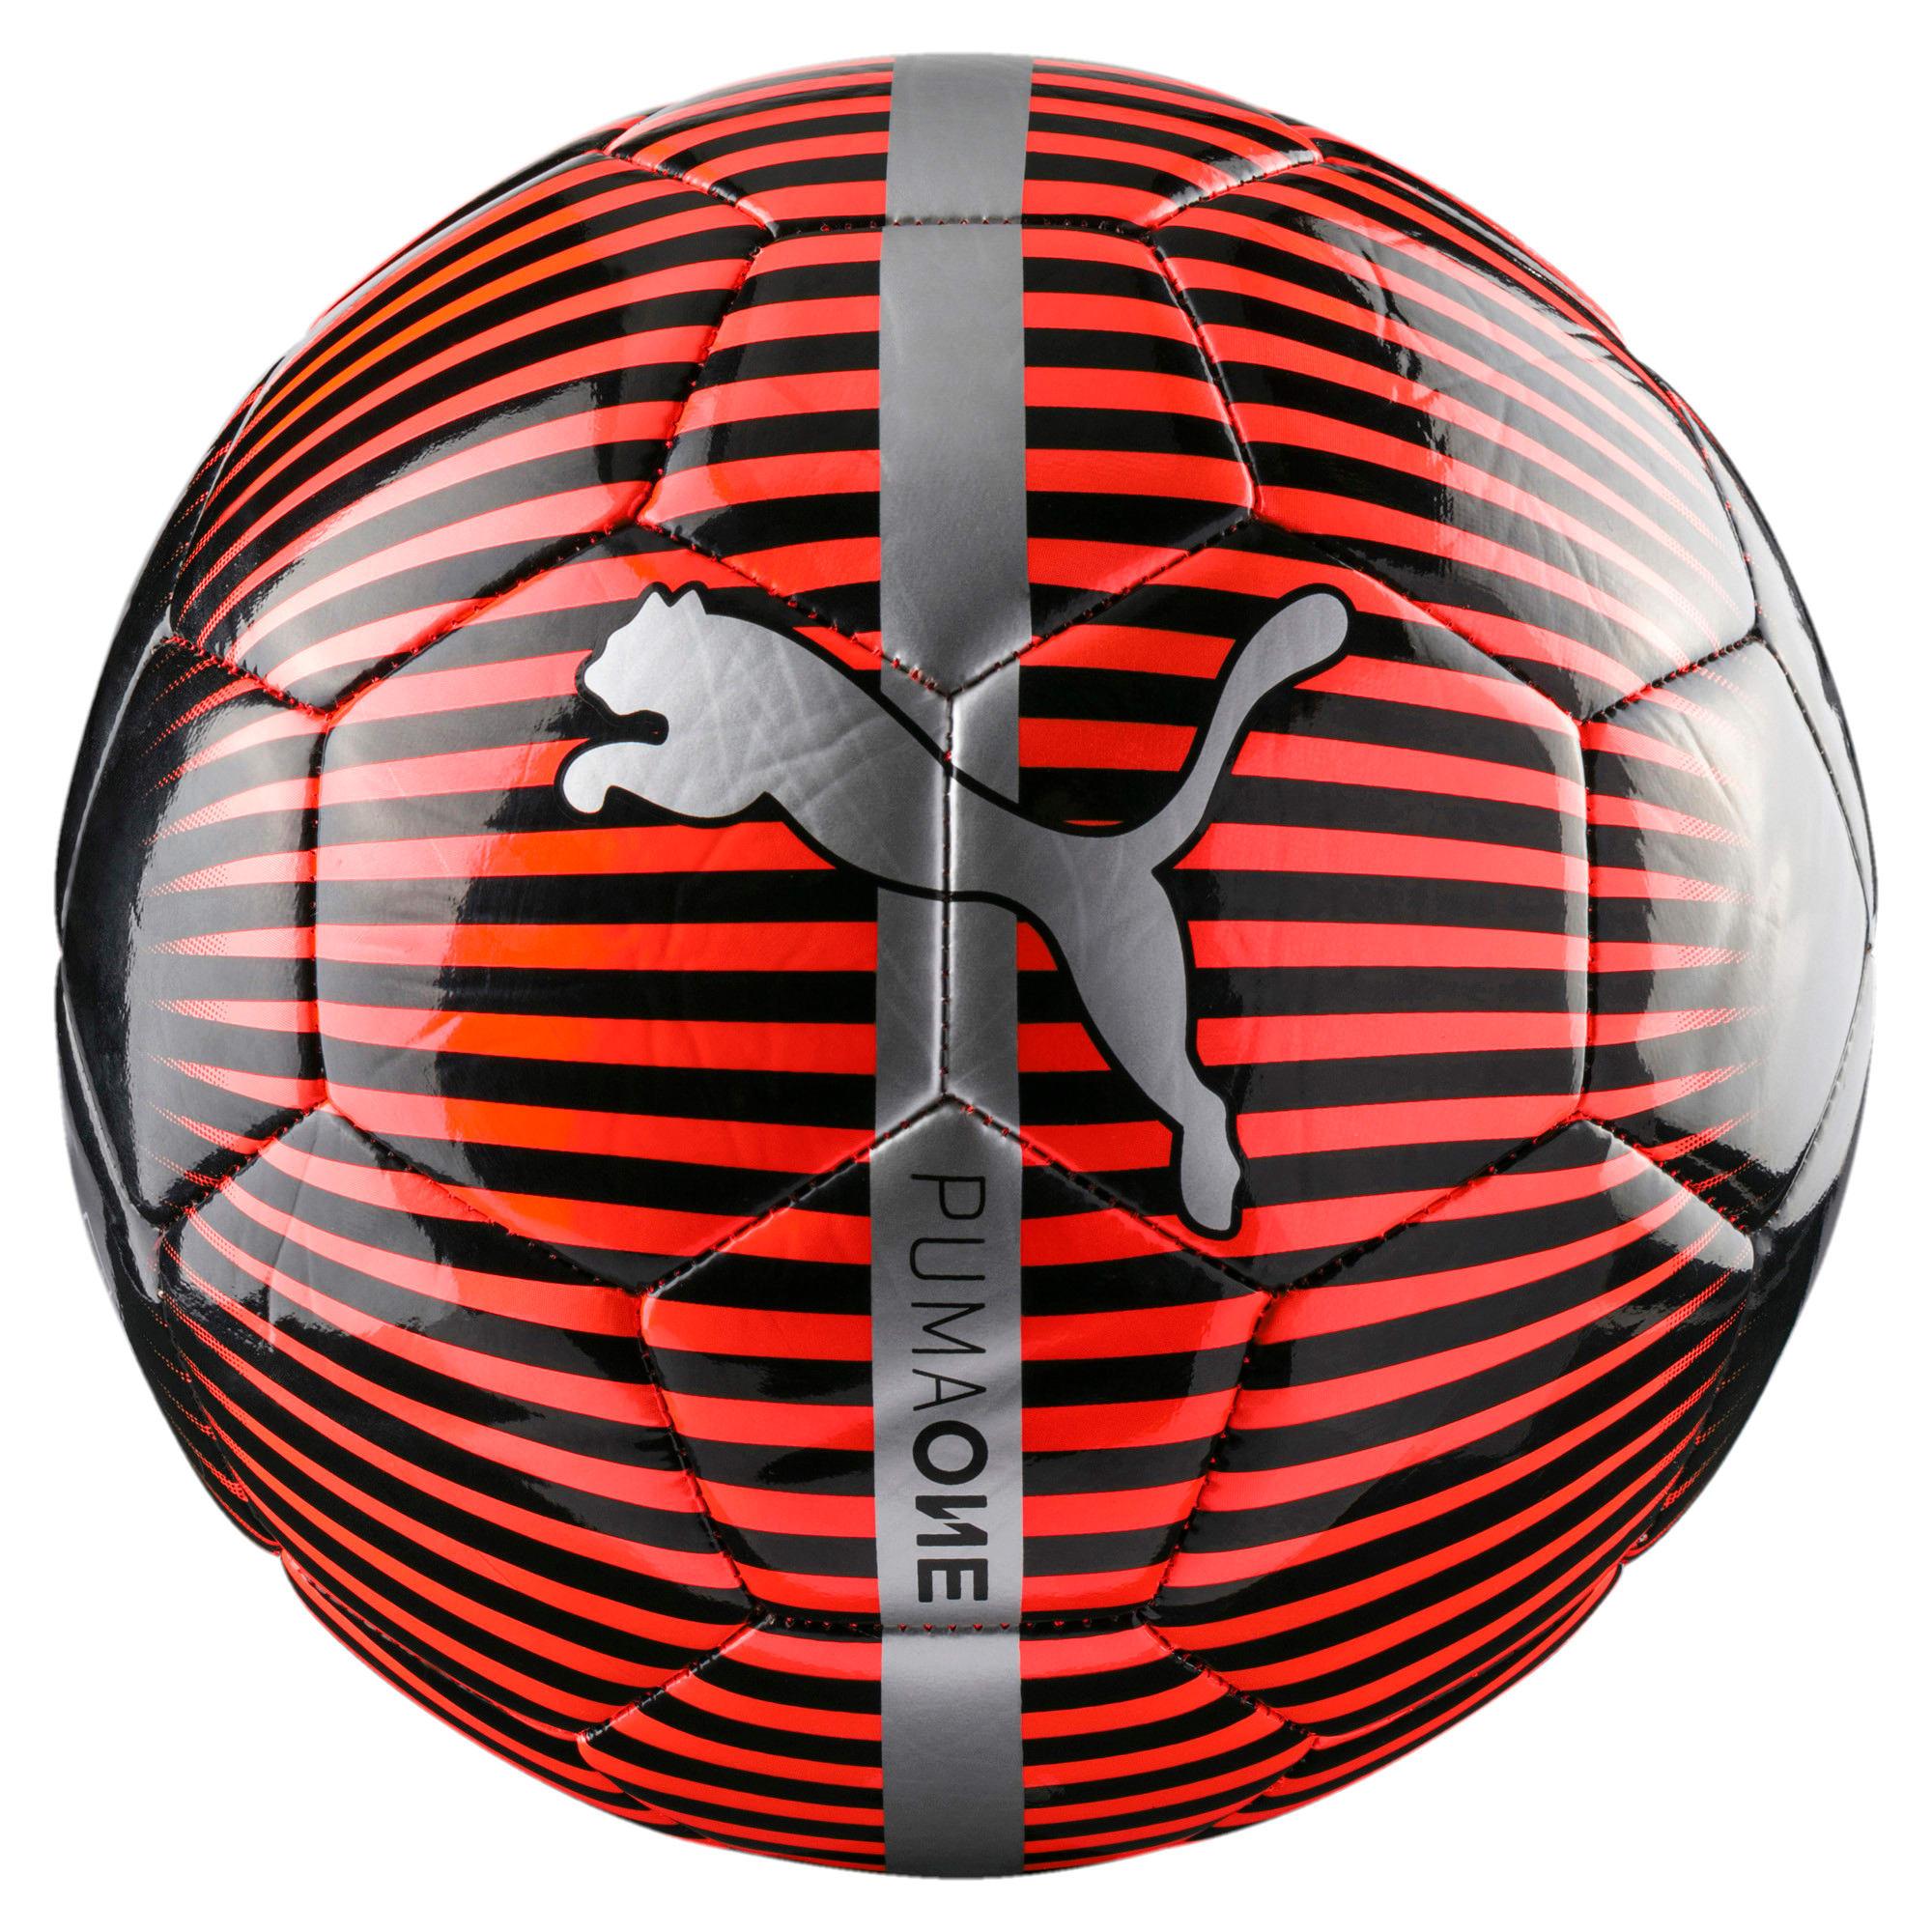 Thumbnail 2 of ONE Chrome Soccer, Red Blast-Puma Black-Silver, medium